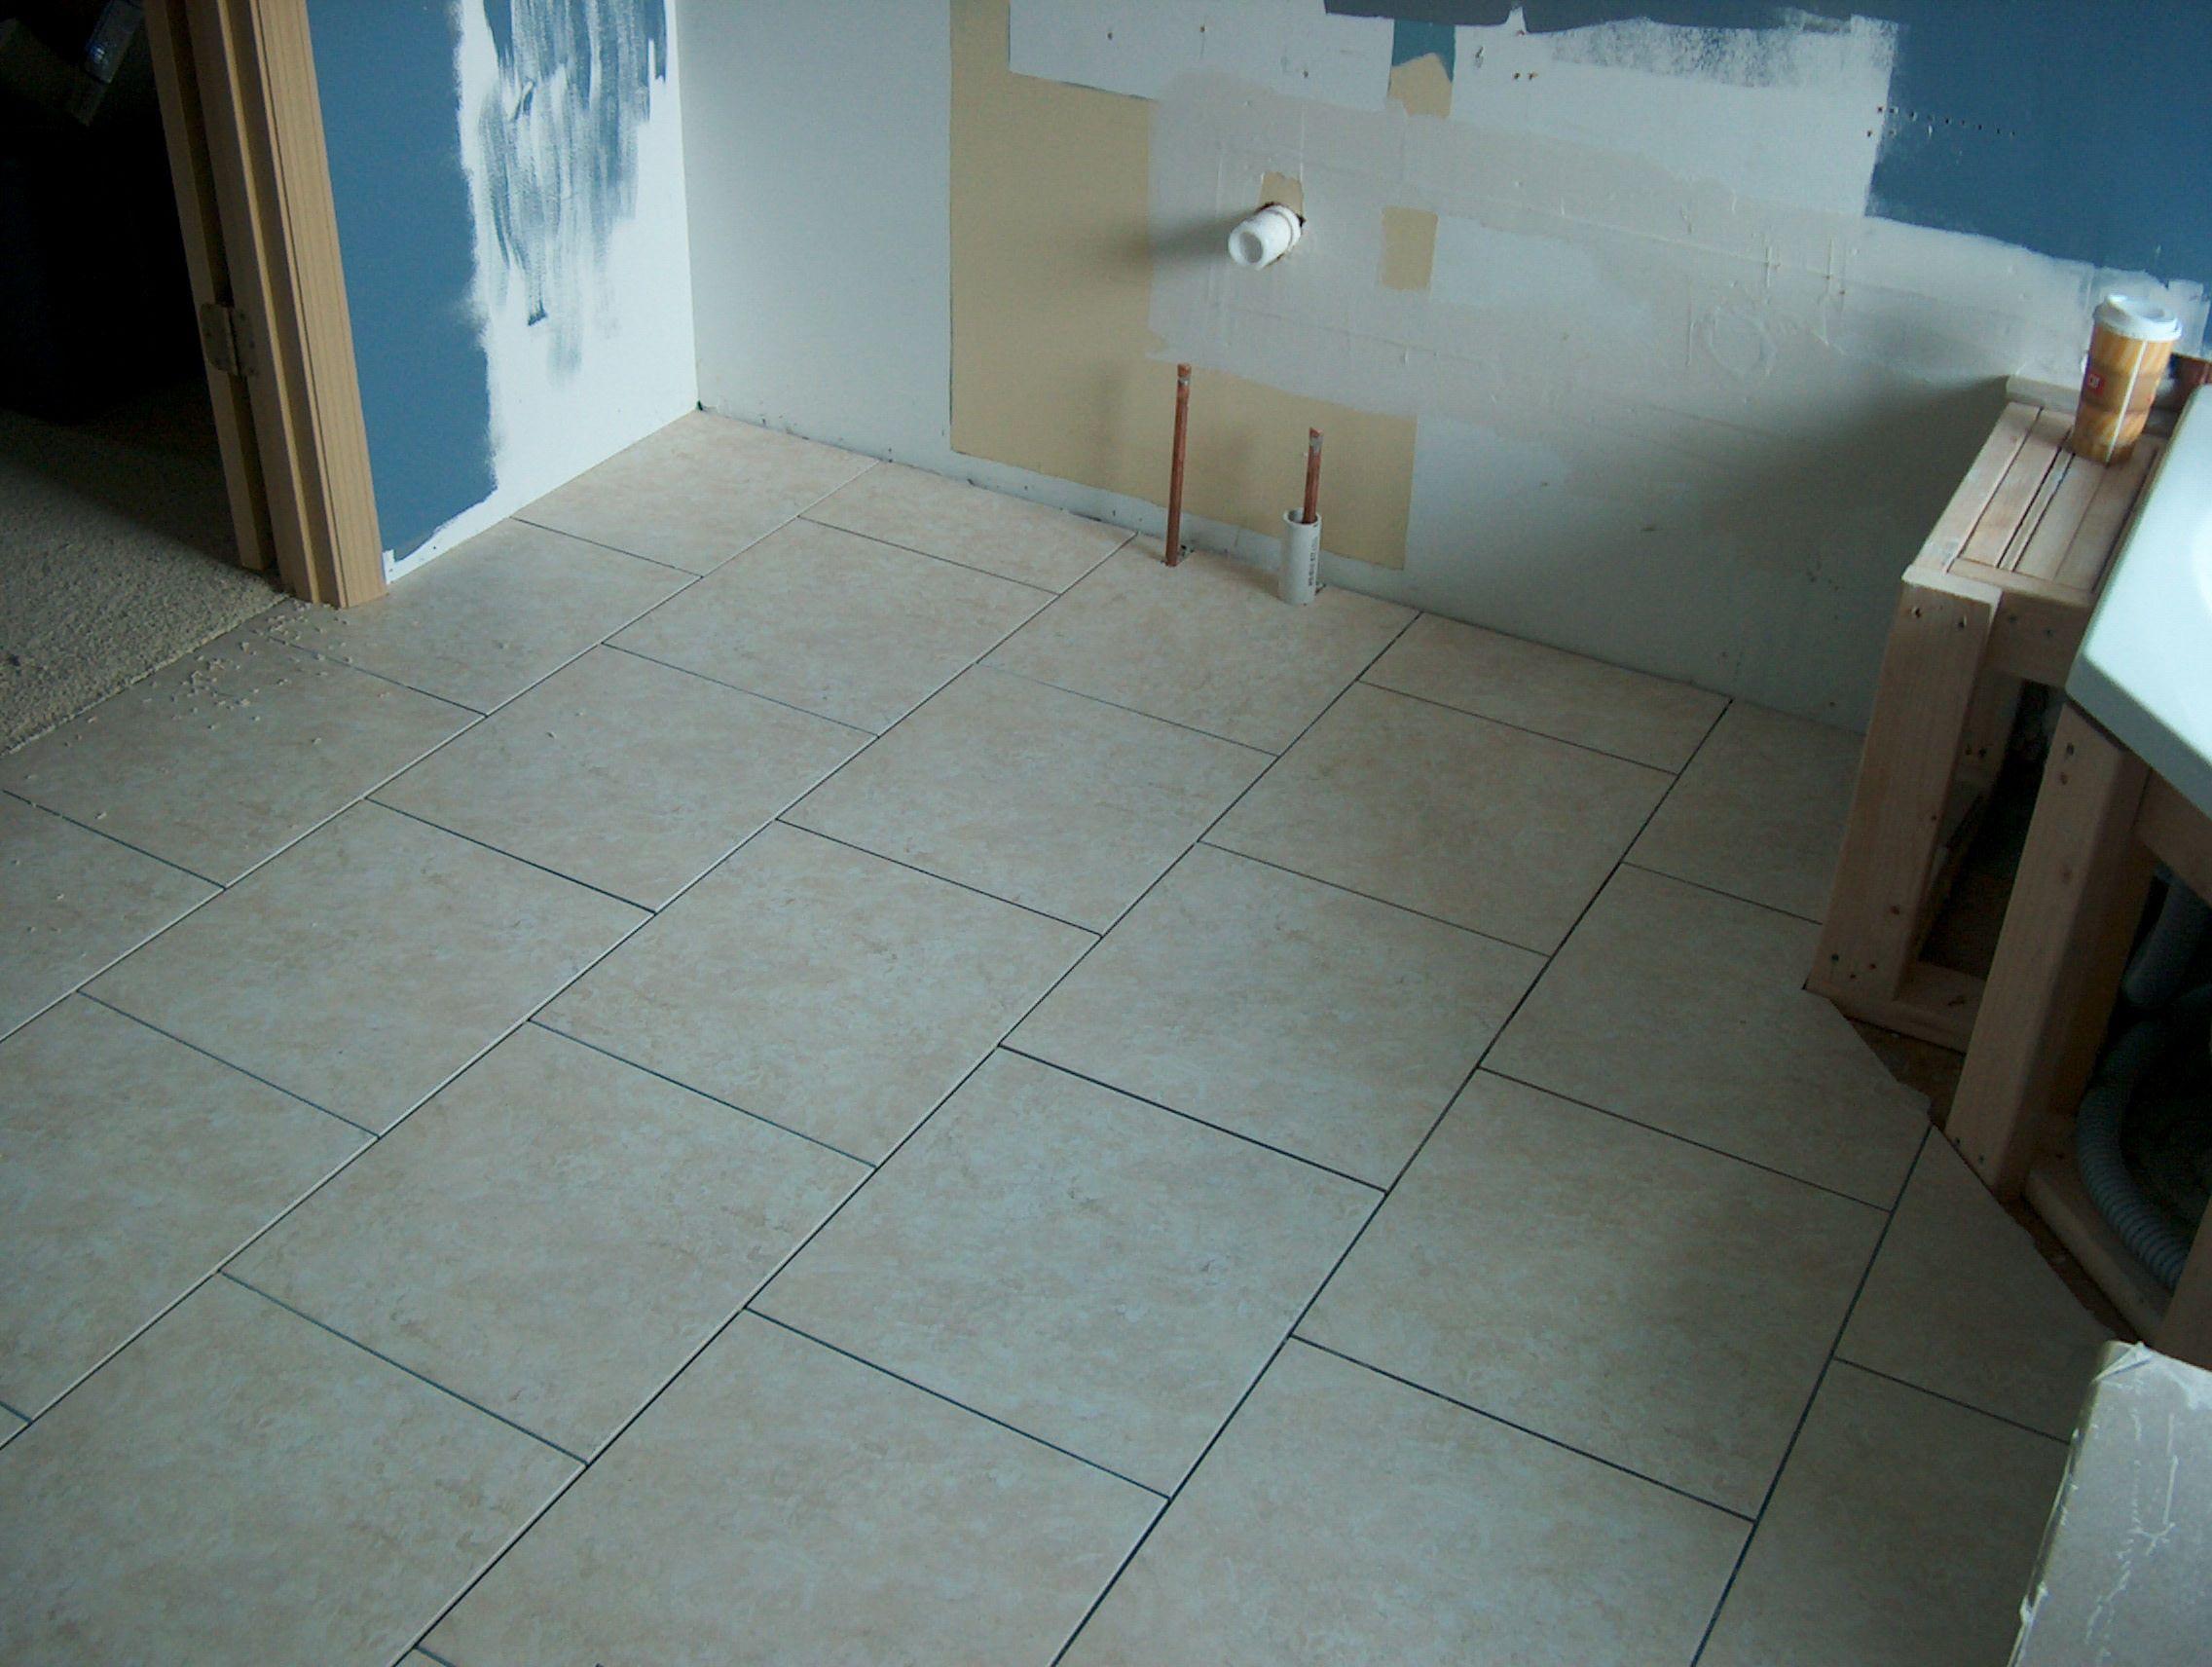 Ceramic floor tile - brick pattern | Bathroom Updates | Pinterest ...